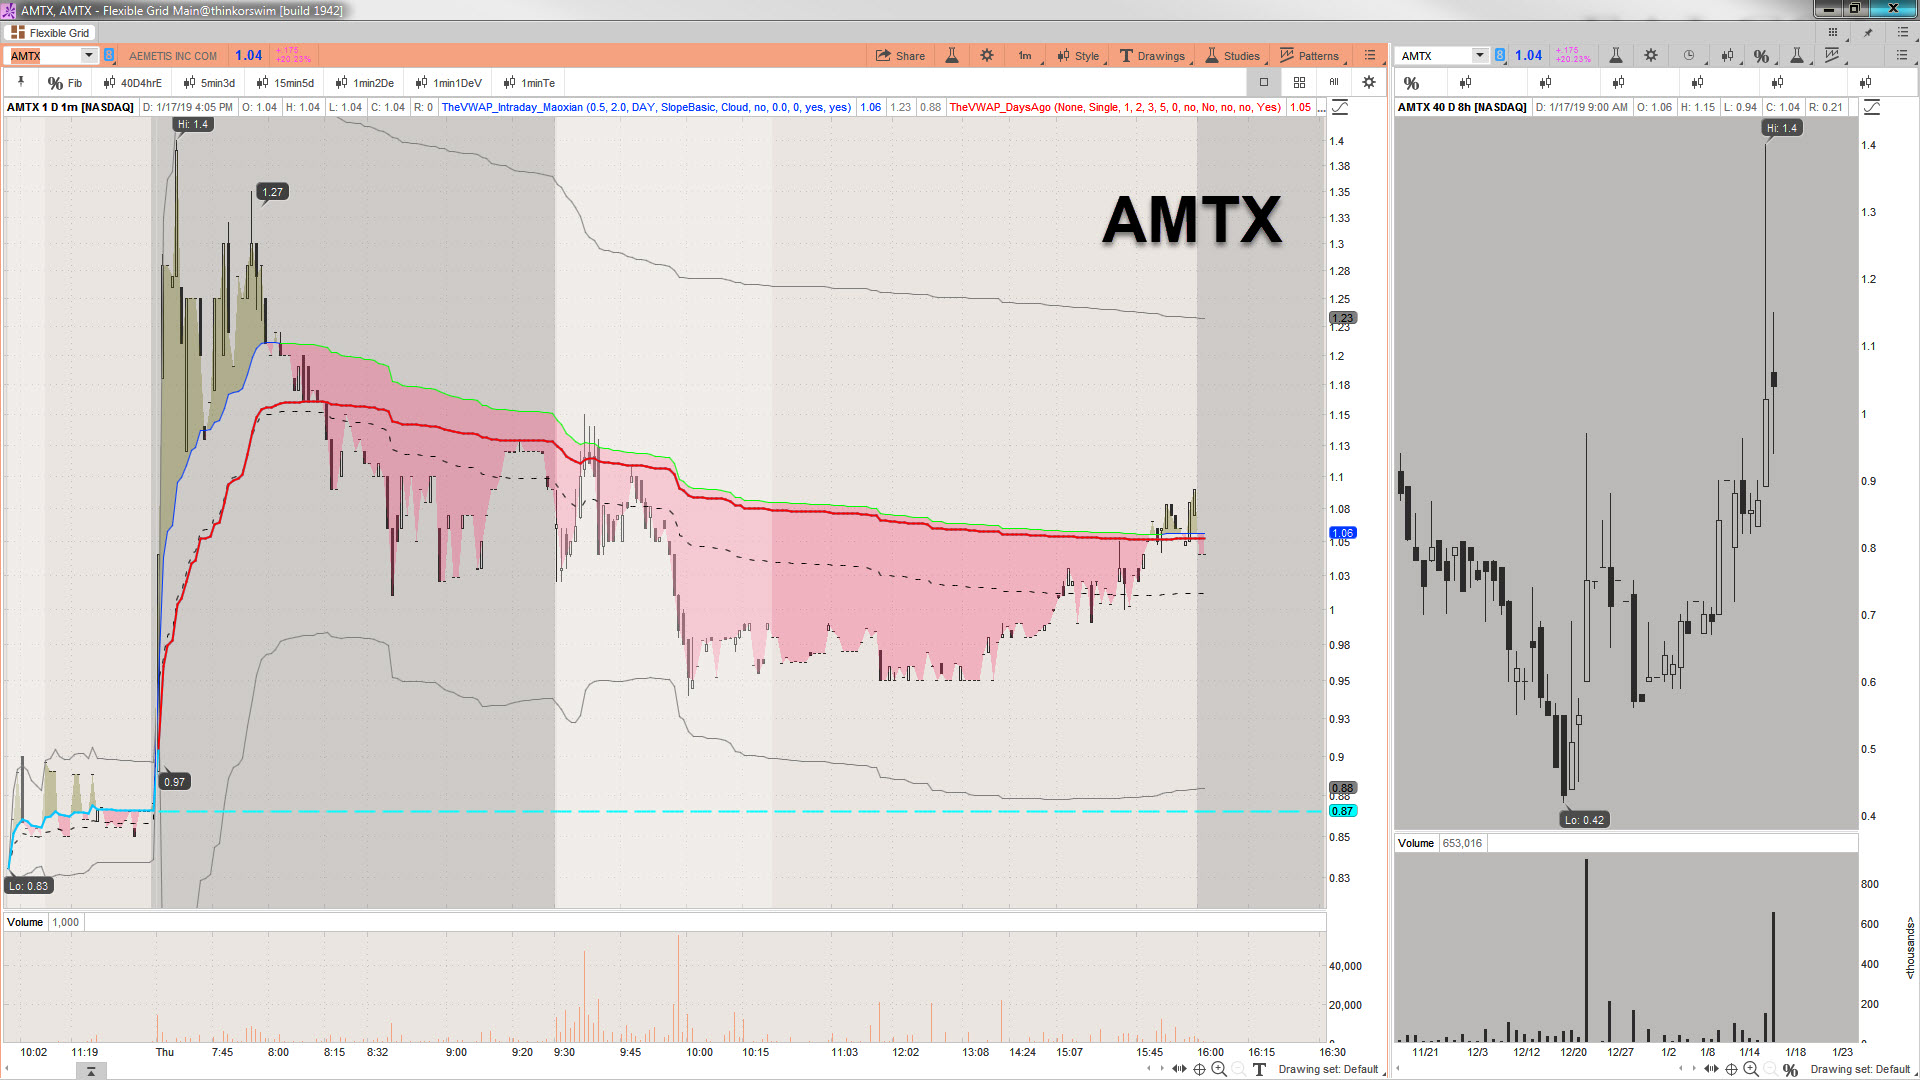 2019-01-17_16-14-48 AMTX.jpg